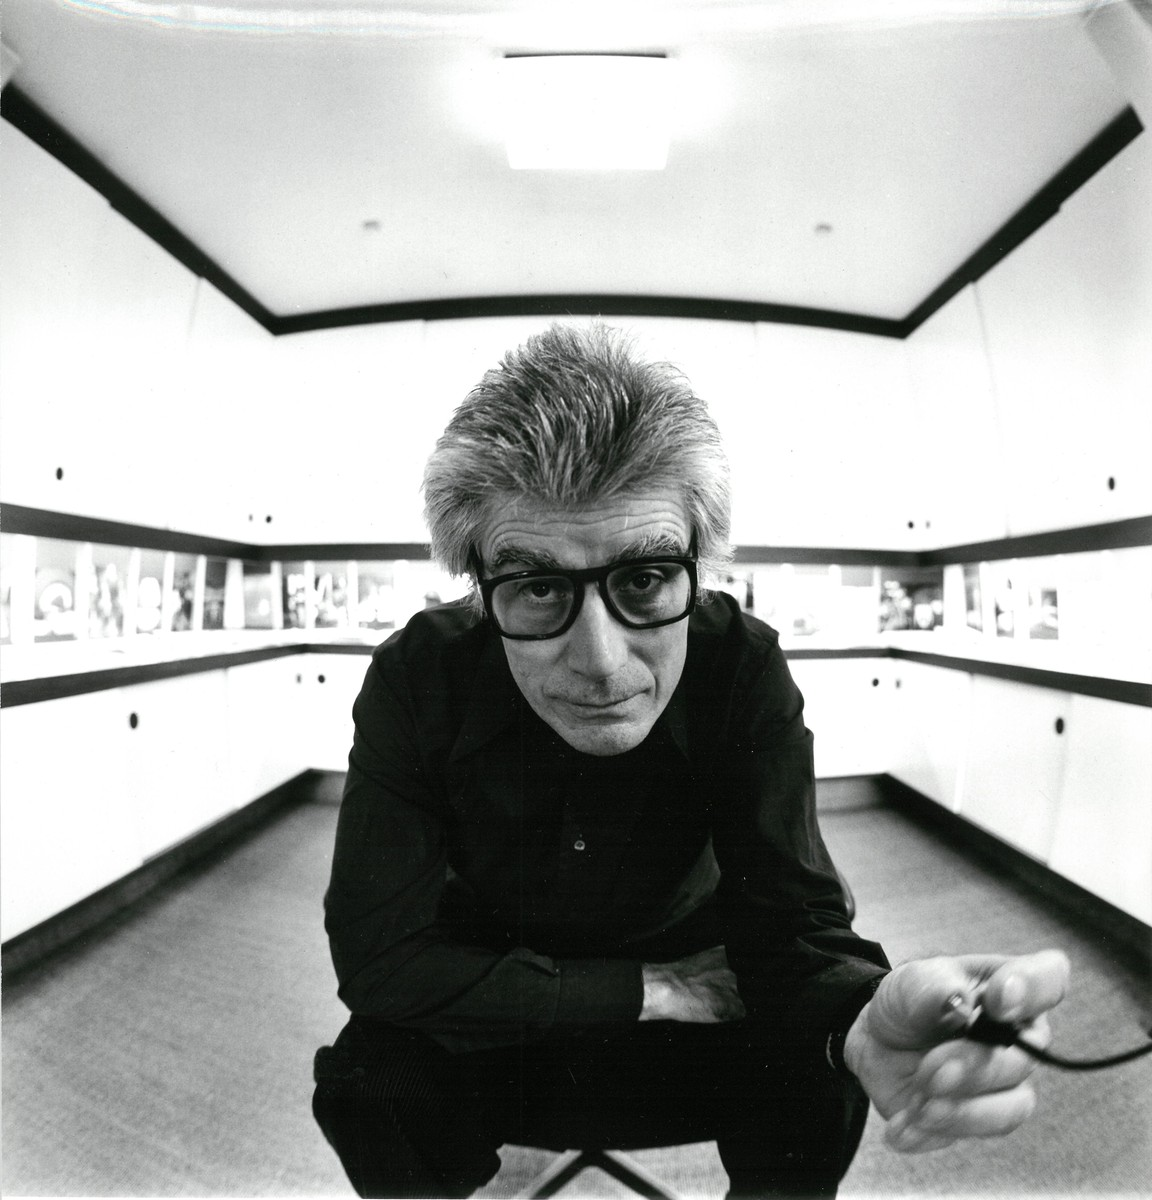 Ludwig Windstosser: Selbstporträt, 1978, Silbergelatinepapier, © Staatliche Museen zu Berlin, Kunstbibliothek / Ludwig Windstosser